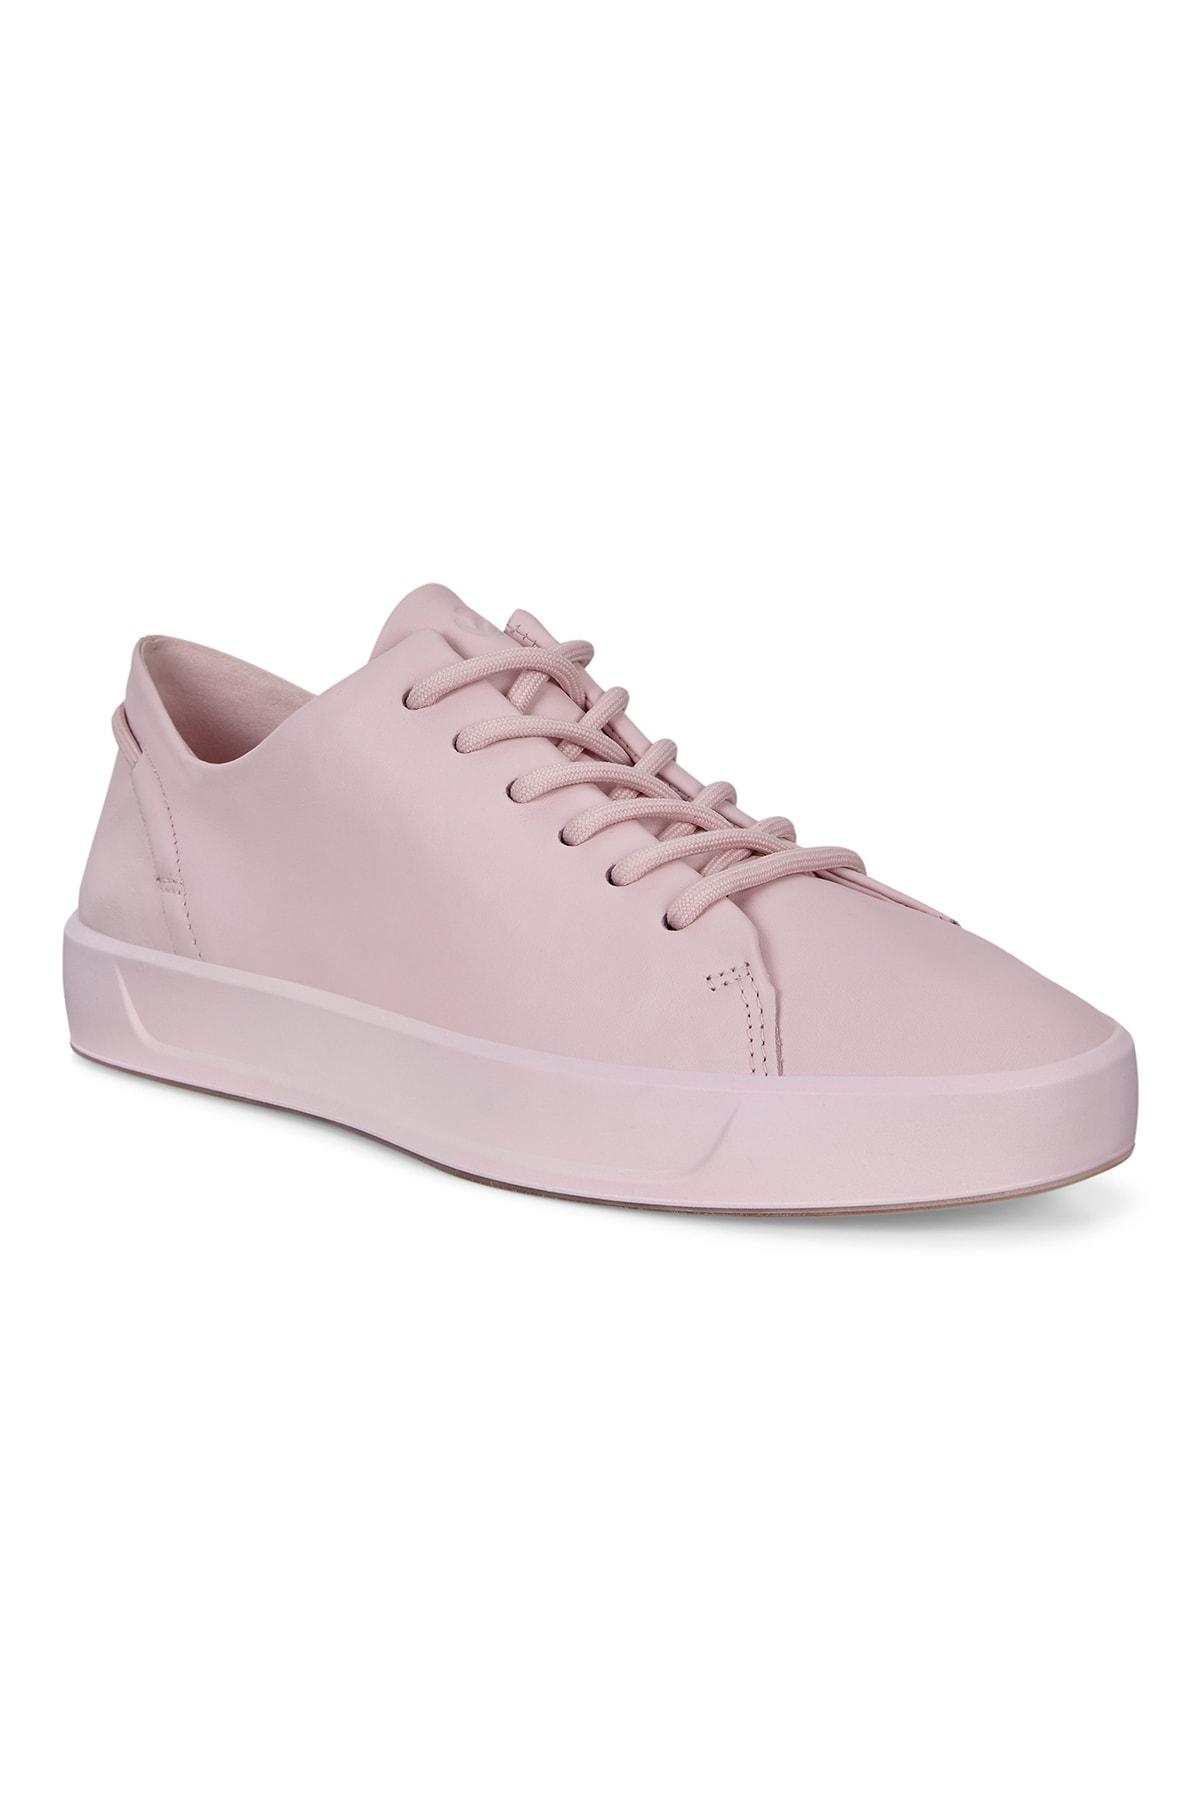 Ecco Kadın Sneaker Soft 8 W Blossom Rose Pembe 450843